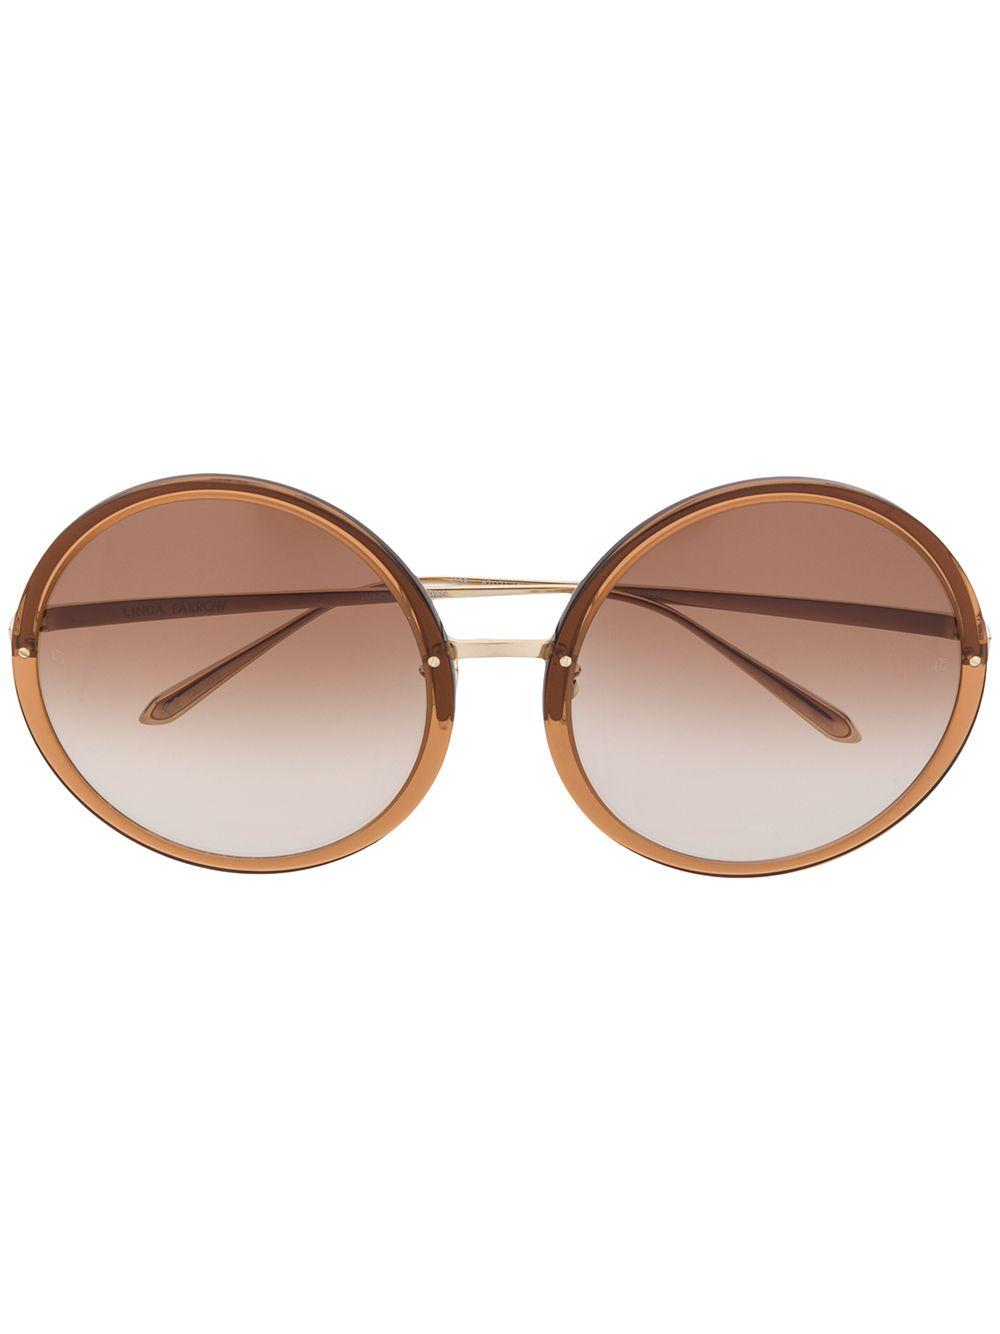 Linda Farrow 'Kew' Sonnenbrille mit rundem Gestell - Gold